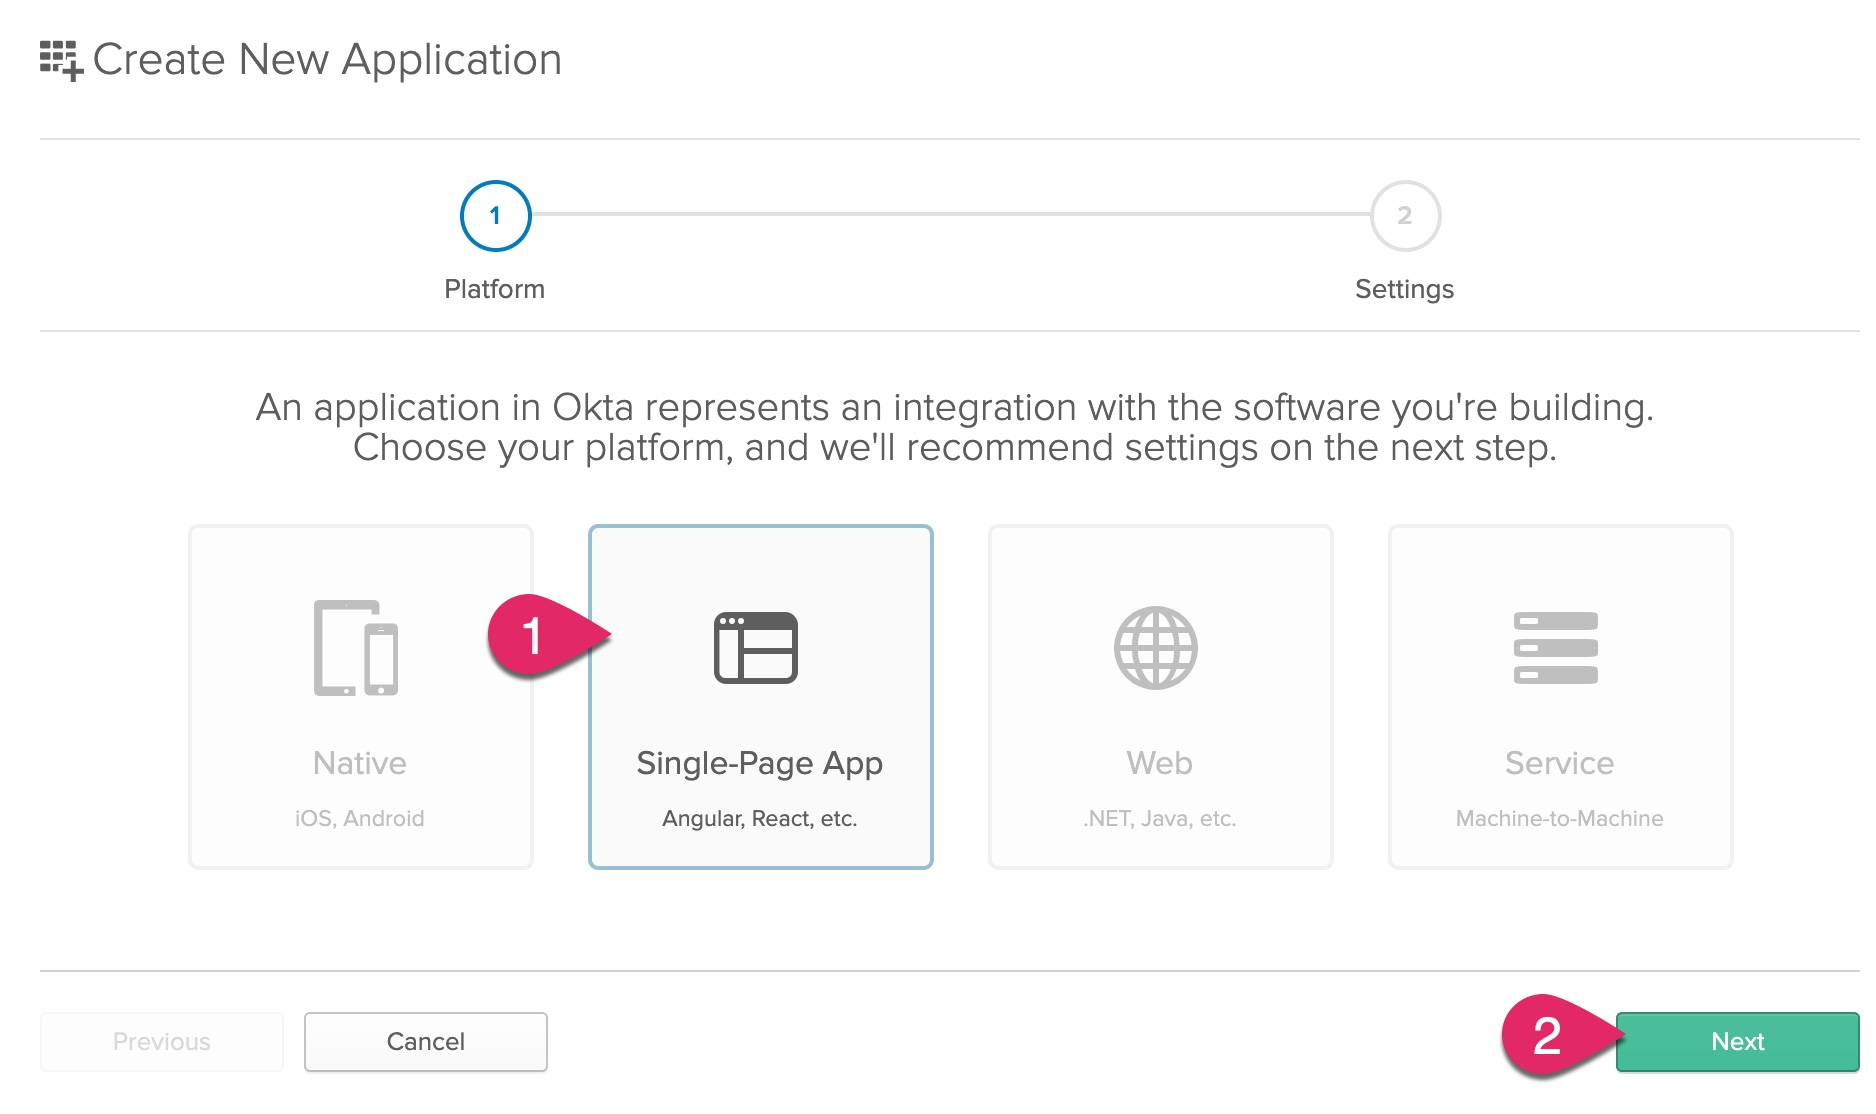 Add single-page app